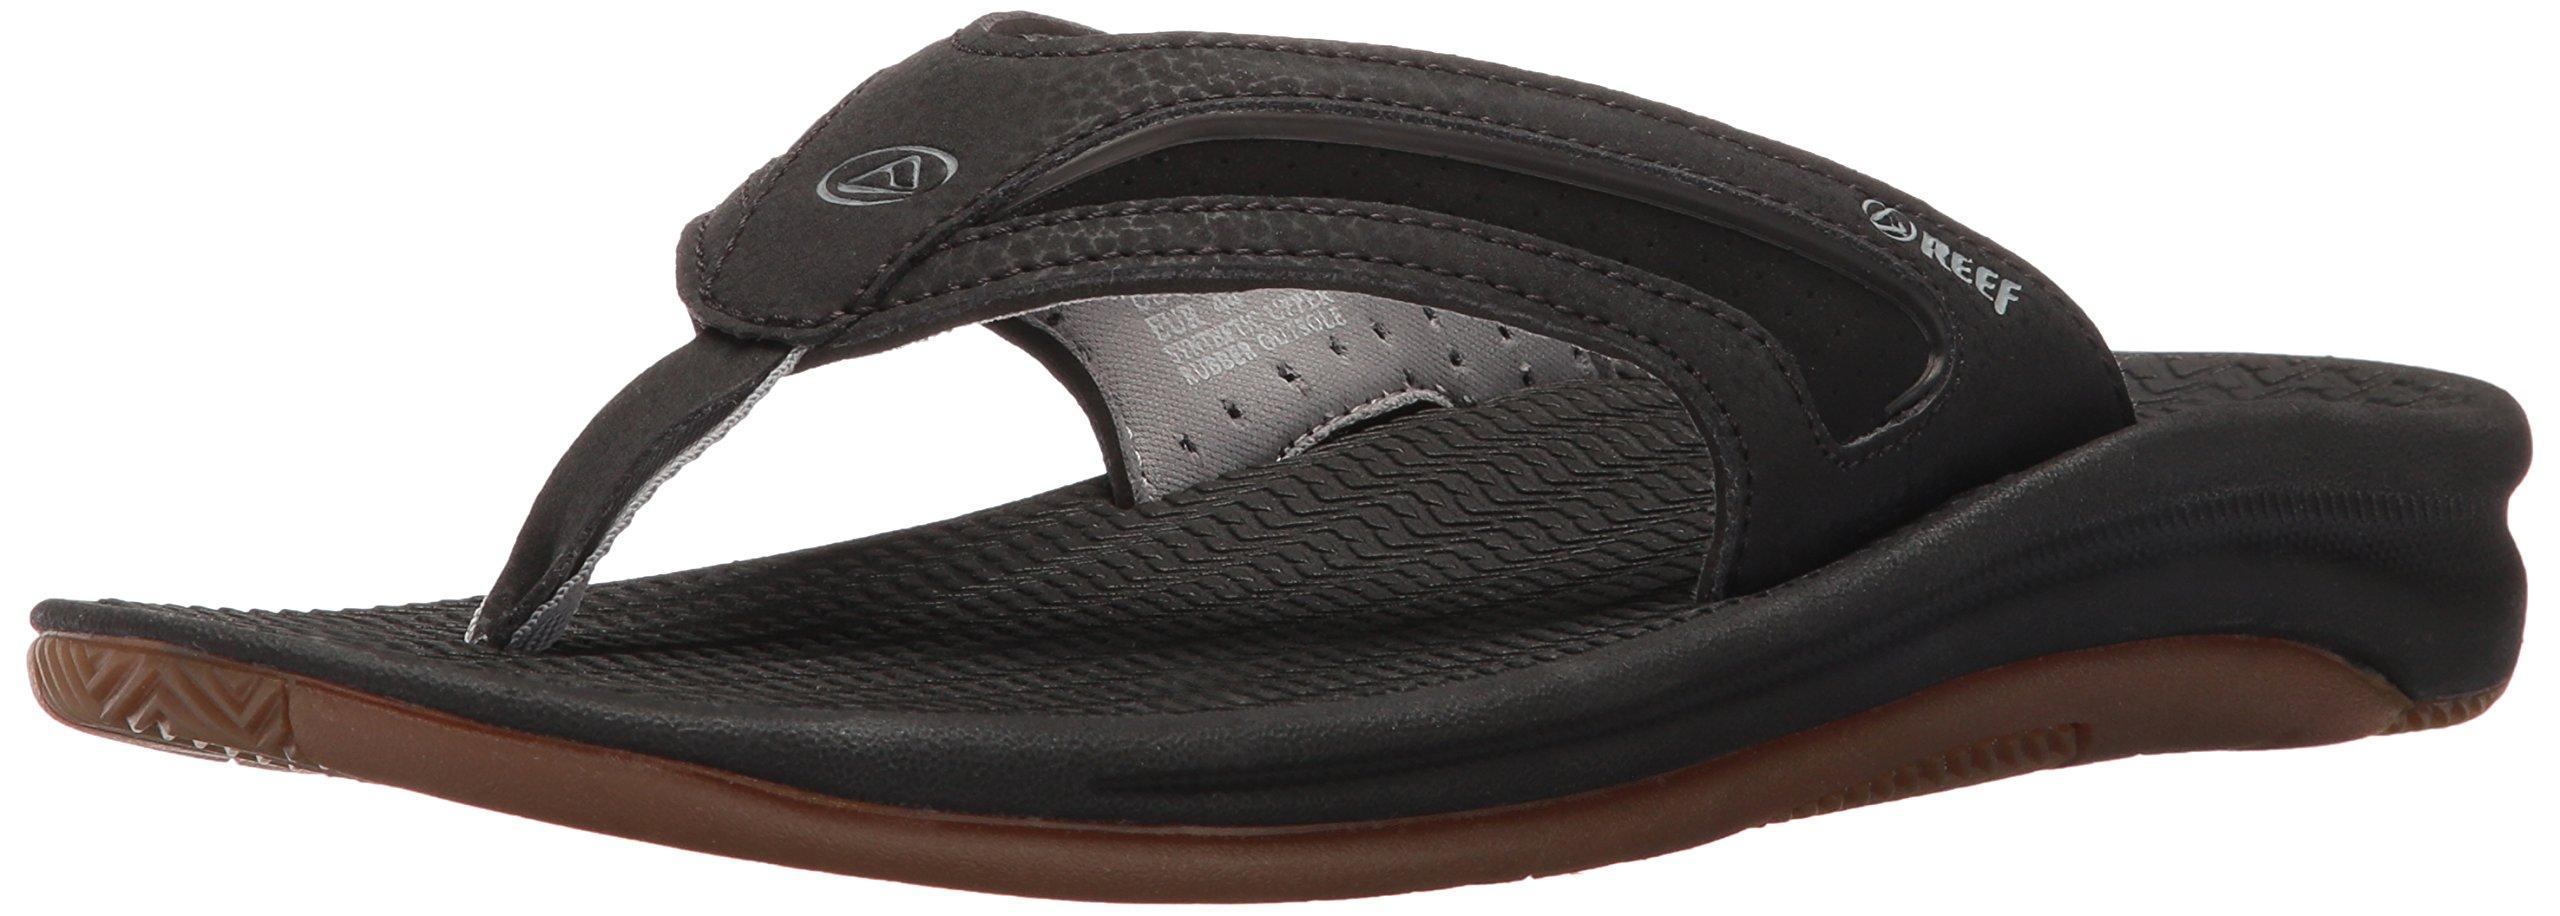 Reef Men's Flex Sandal, Black/Silver, 13 M US